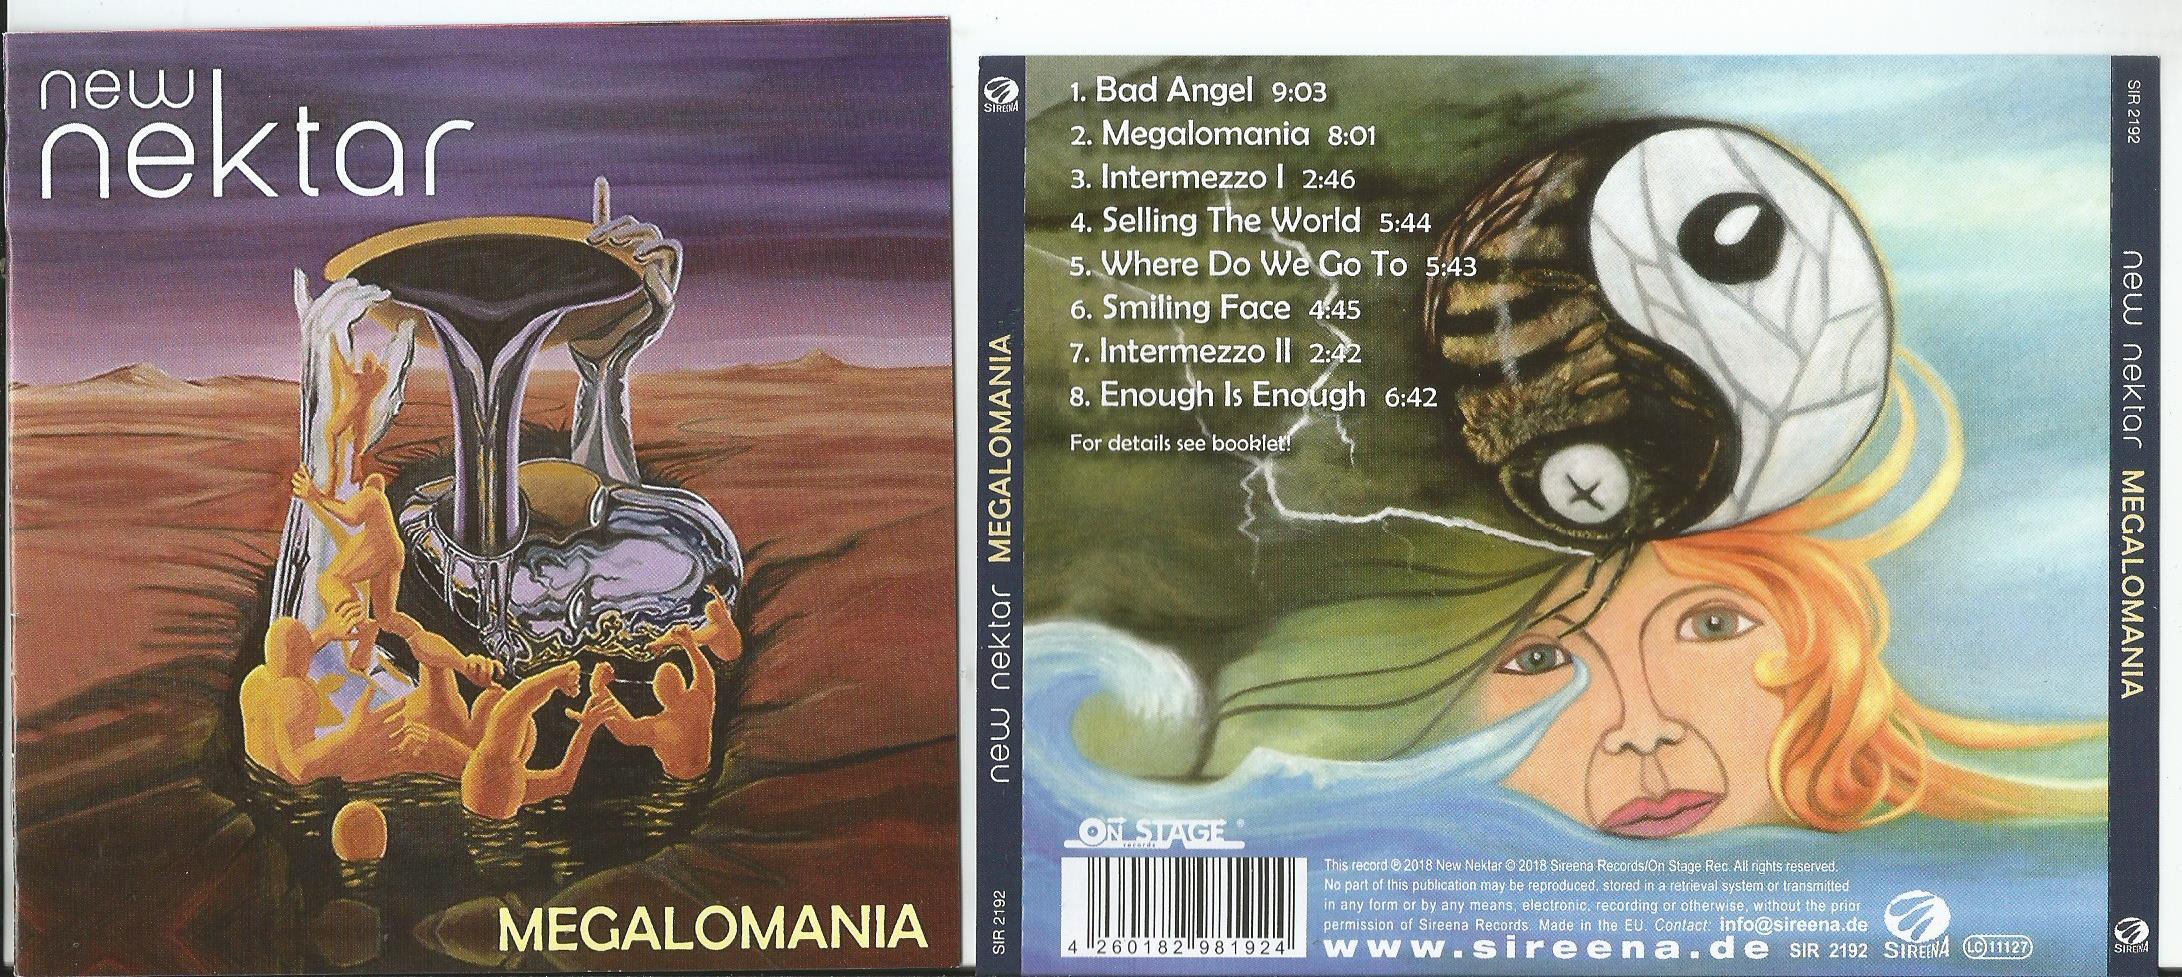 NEKTAR Megalomania (12page booklet with lyrics)